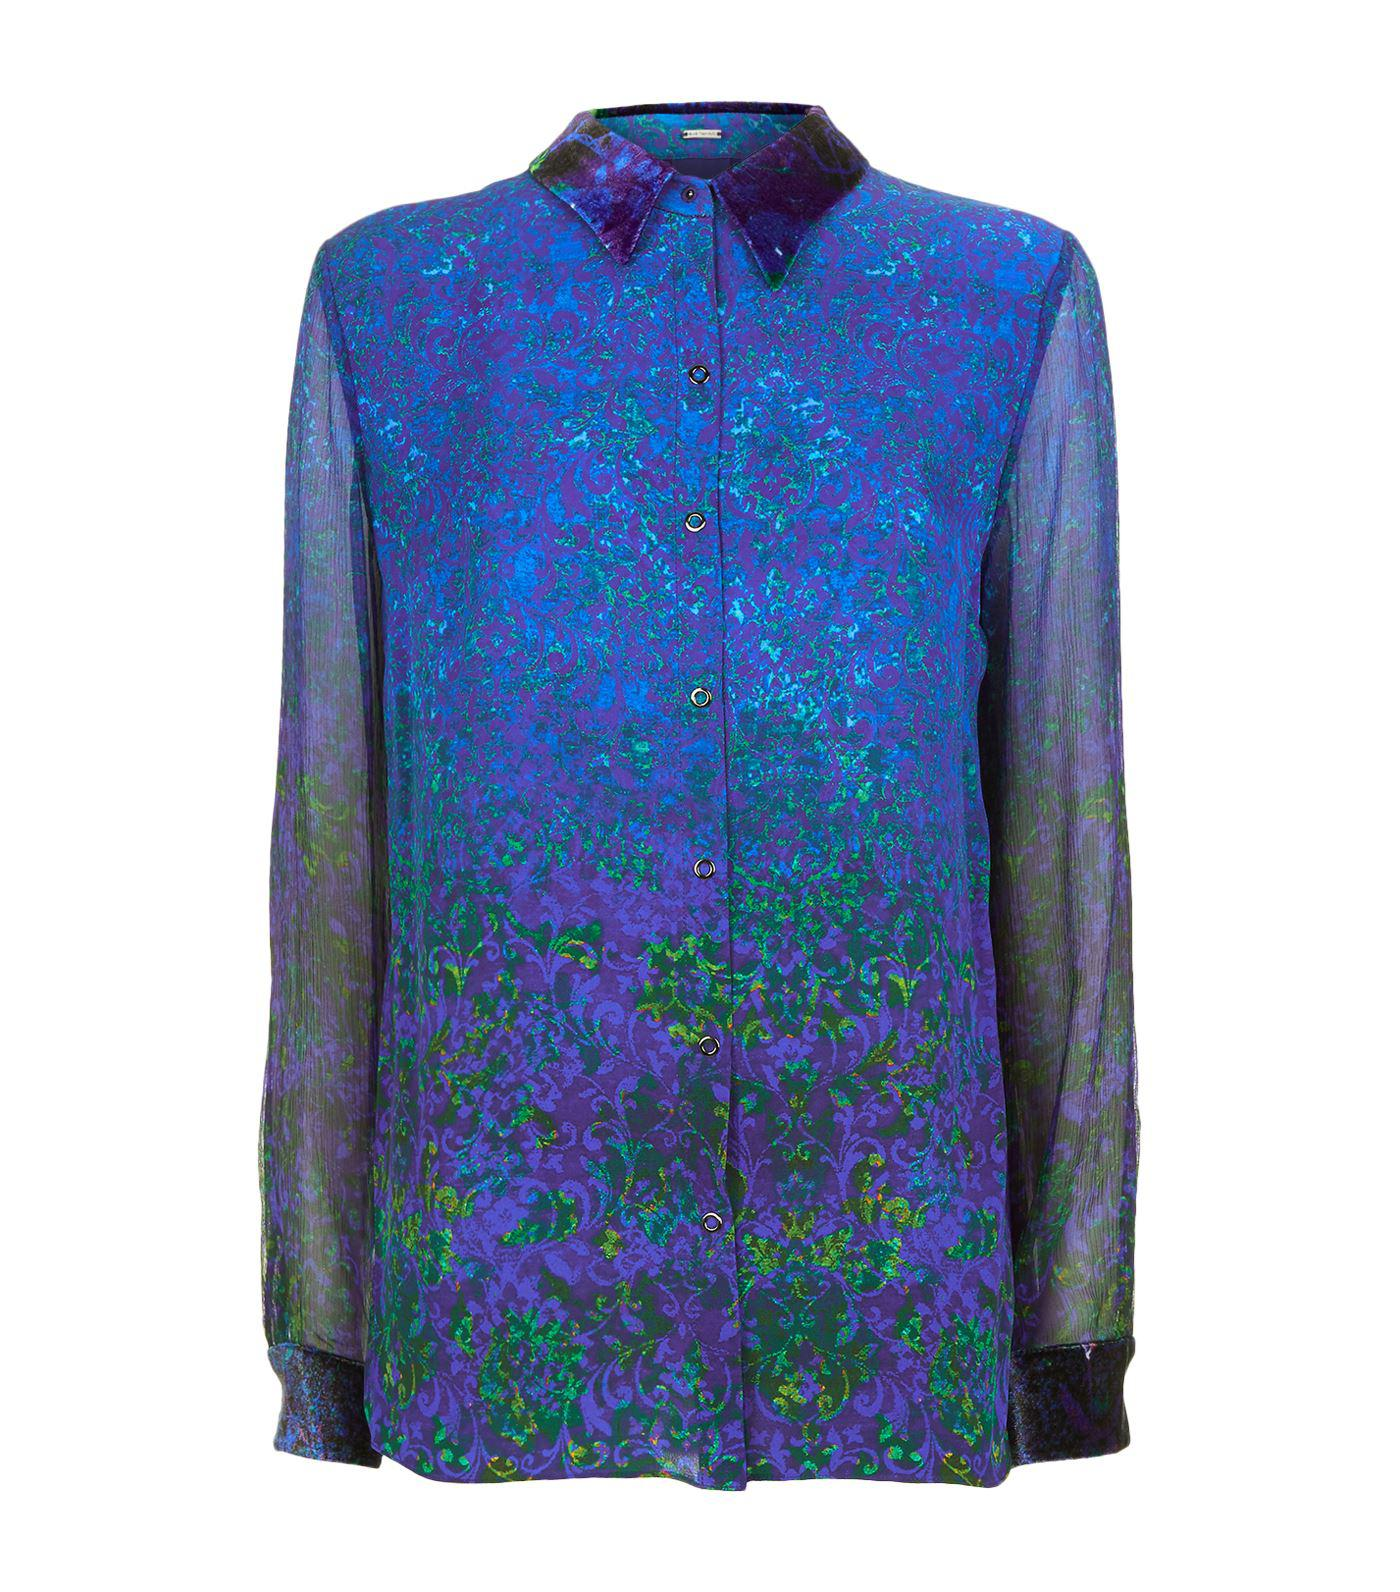 eda194e52c1dd6 Lyst - Elie Tahari Martha Printed Blouse in Blue